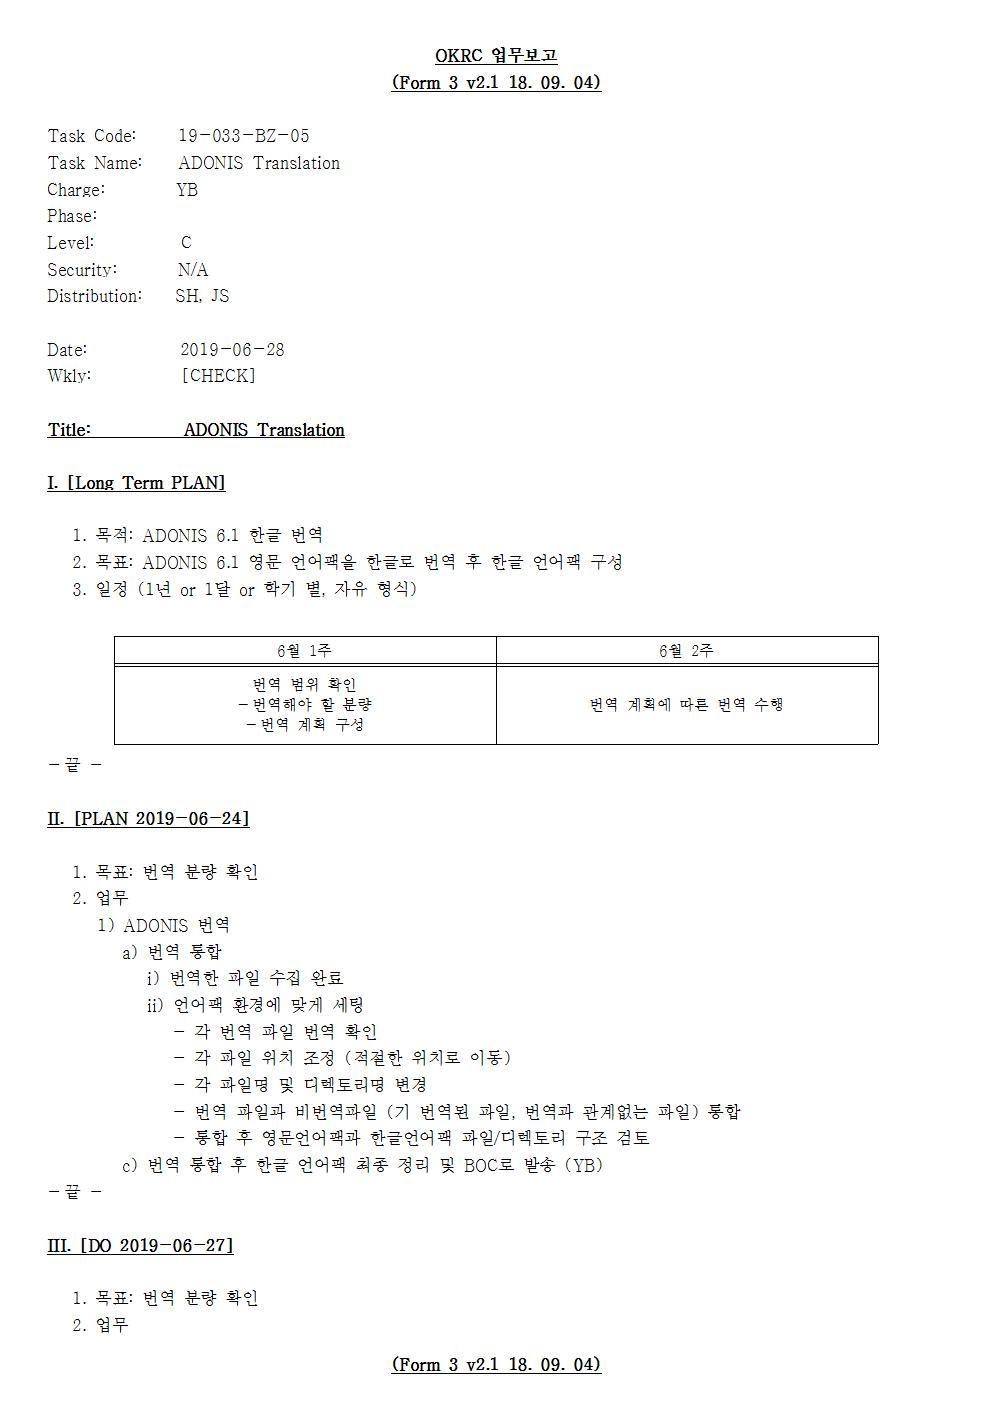 D-[19-033-BZ-05]-[ADONIS Translation]-[2019-06-28][YB]-[19-6-4]-[P+D+C]001.jpg